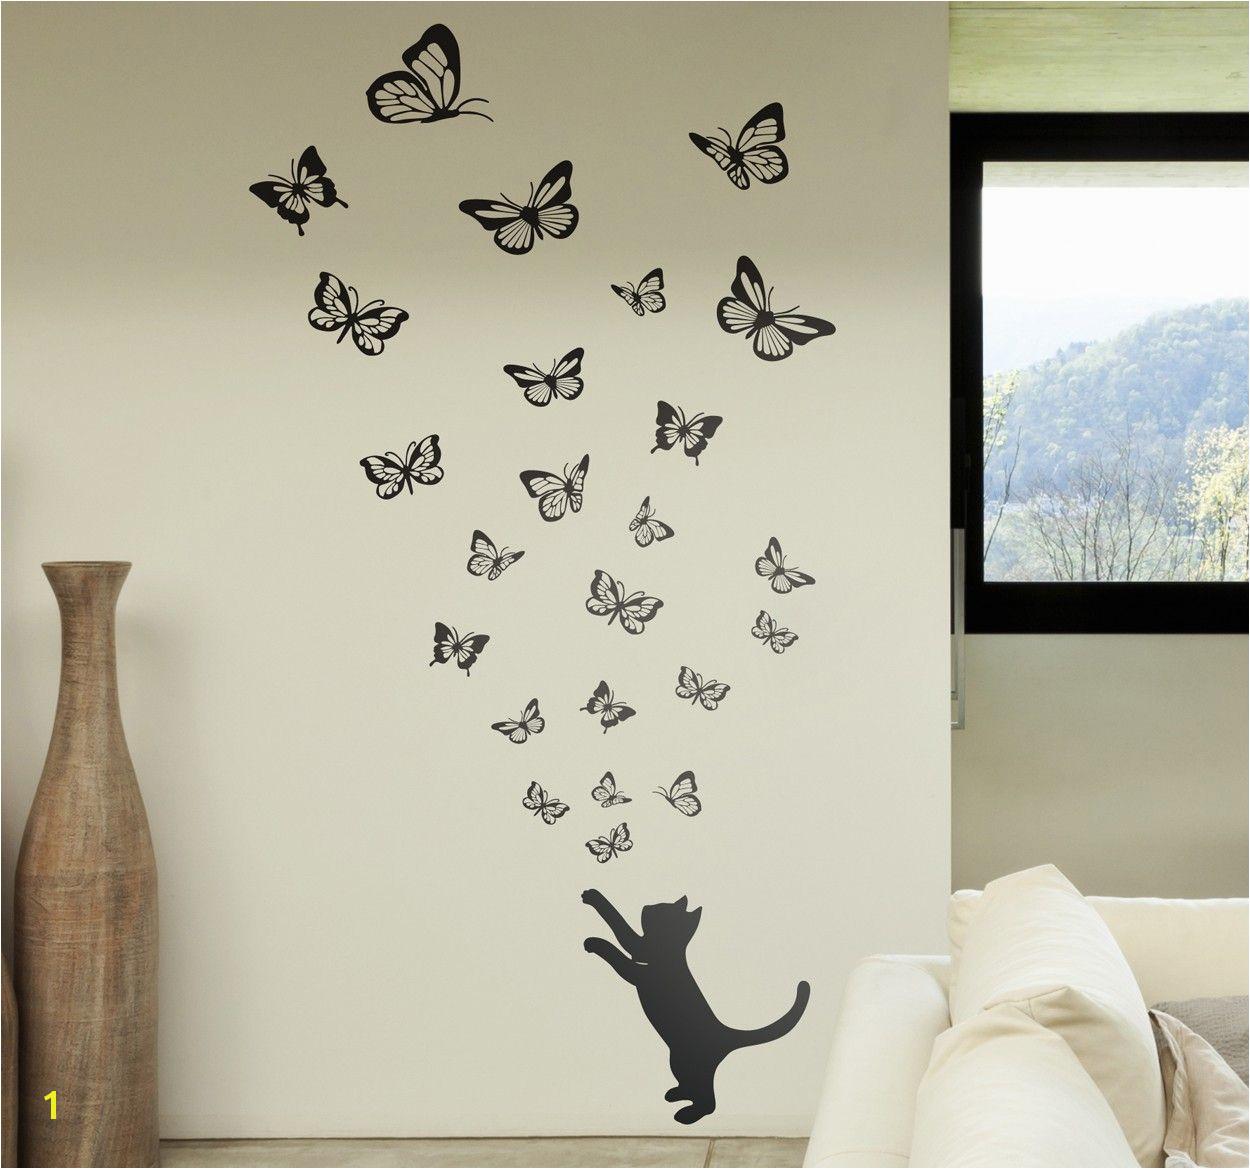 gatto e farfalle stencil da muro Wallpaper Ceiling Ceiling Murals Arte Nas Paredes